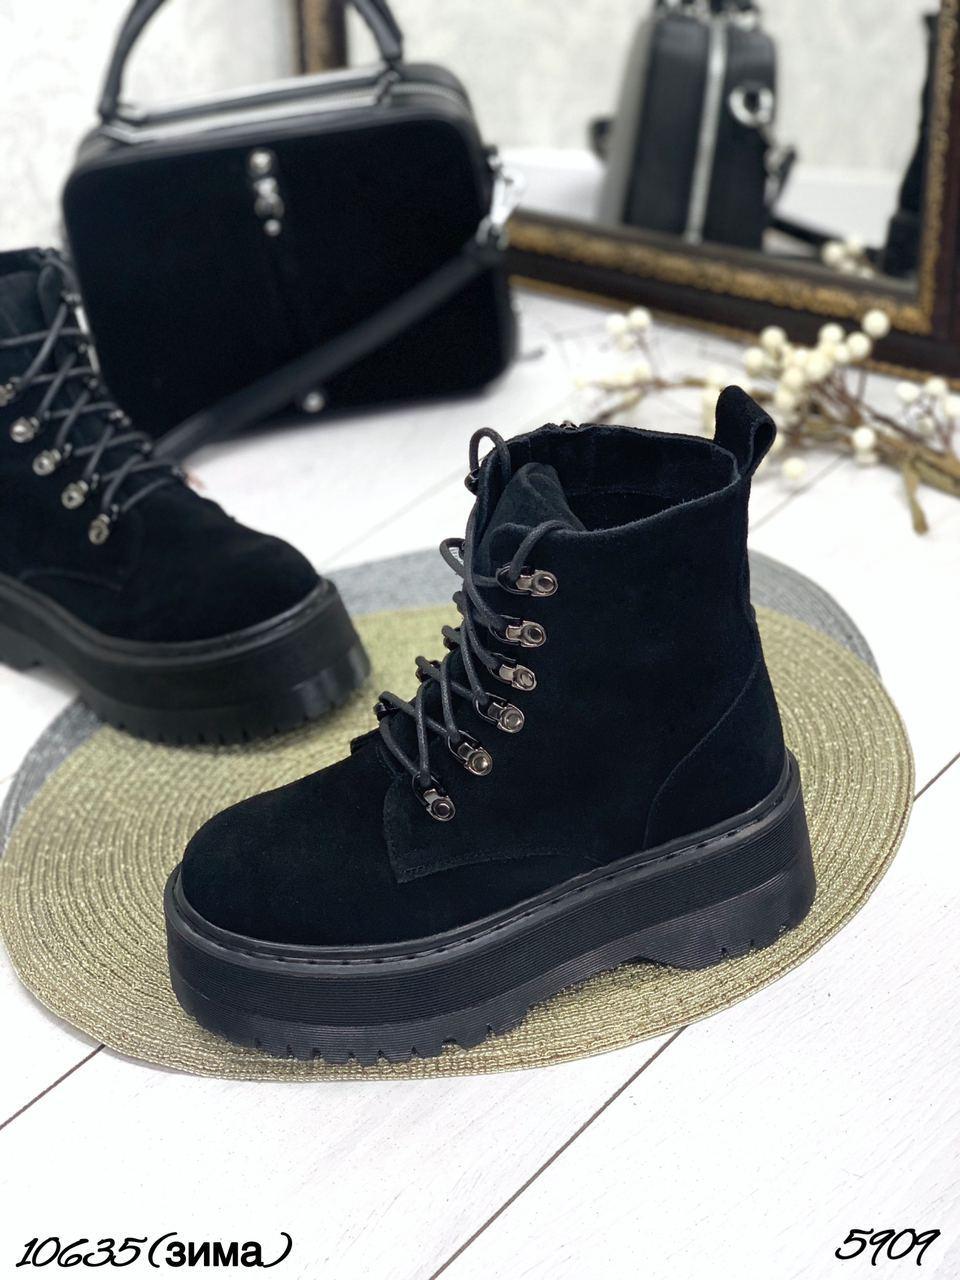 Ботинки Marty деми черная замша на высокой подошве В наличии и под заказ